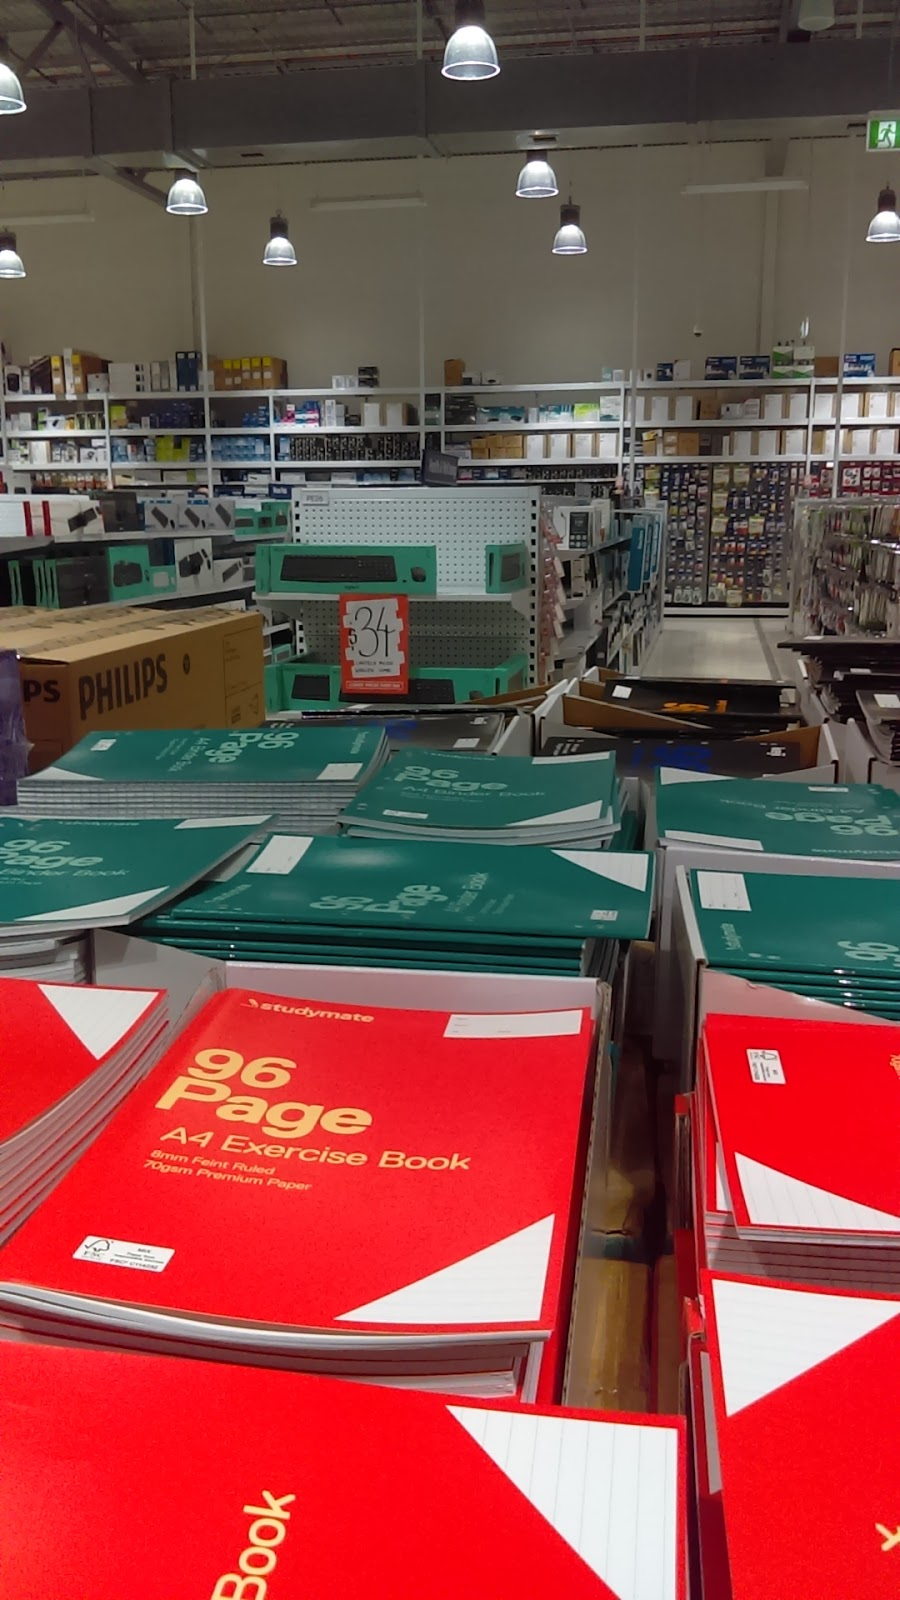 Officeworks Traralgon   electronics store   Shop 6/149 - 163 Argyle St, Traralgon VIC 3844, Australia   0351775100 OR +61 3 5177 5100